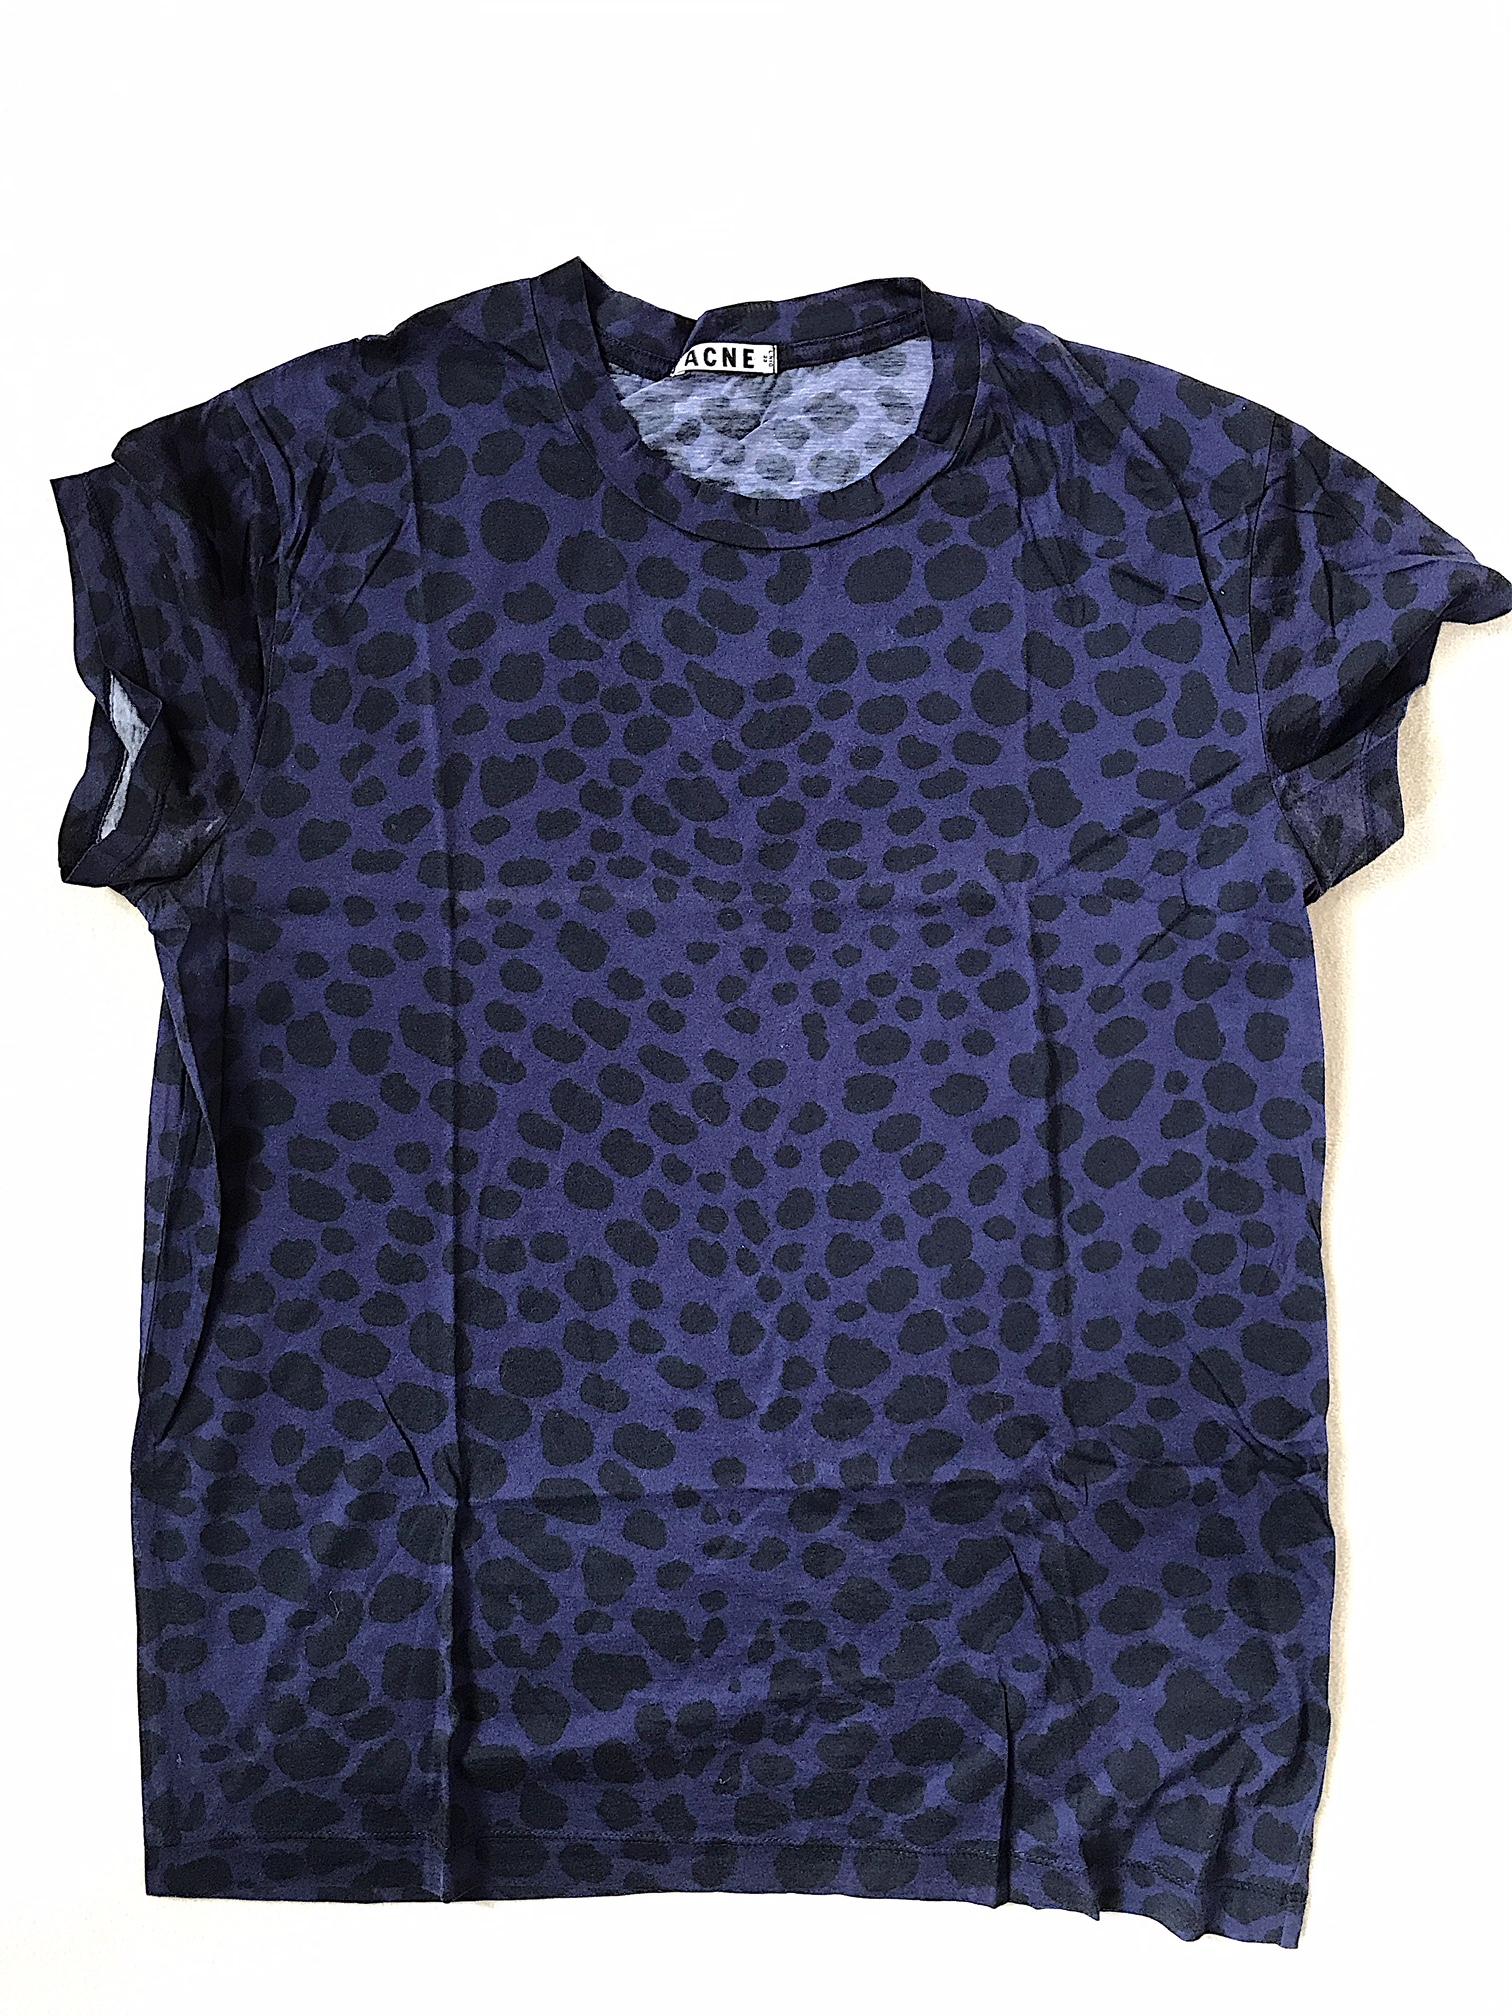 951c2dfad5d7 Black Leopard Print T Shirts « Alzheimer's Network of Oregon